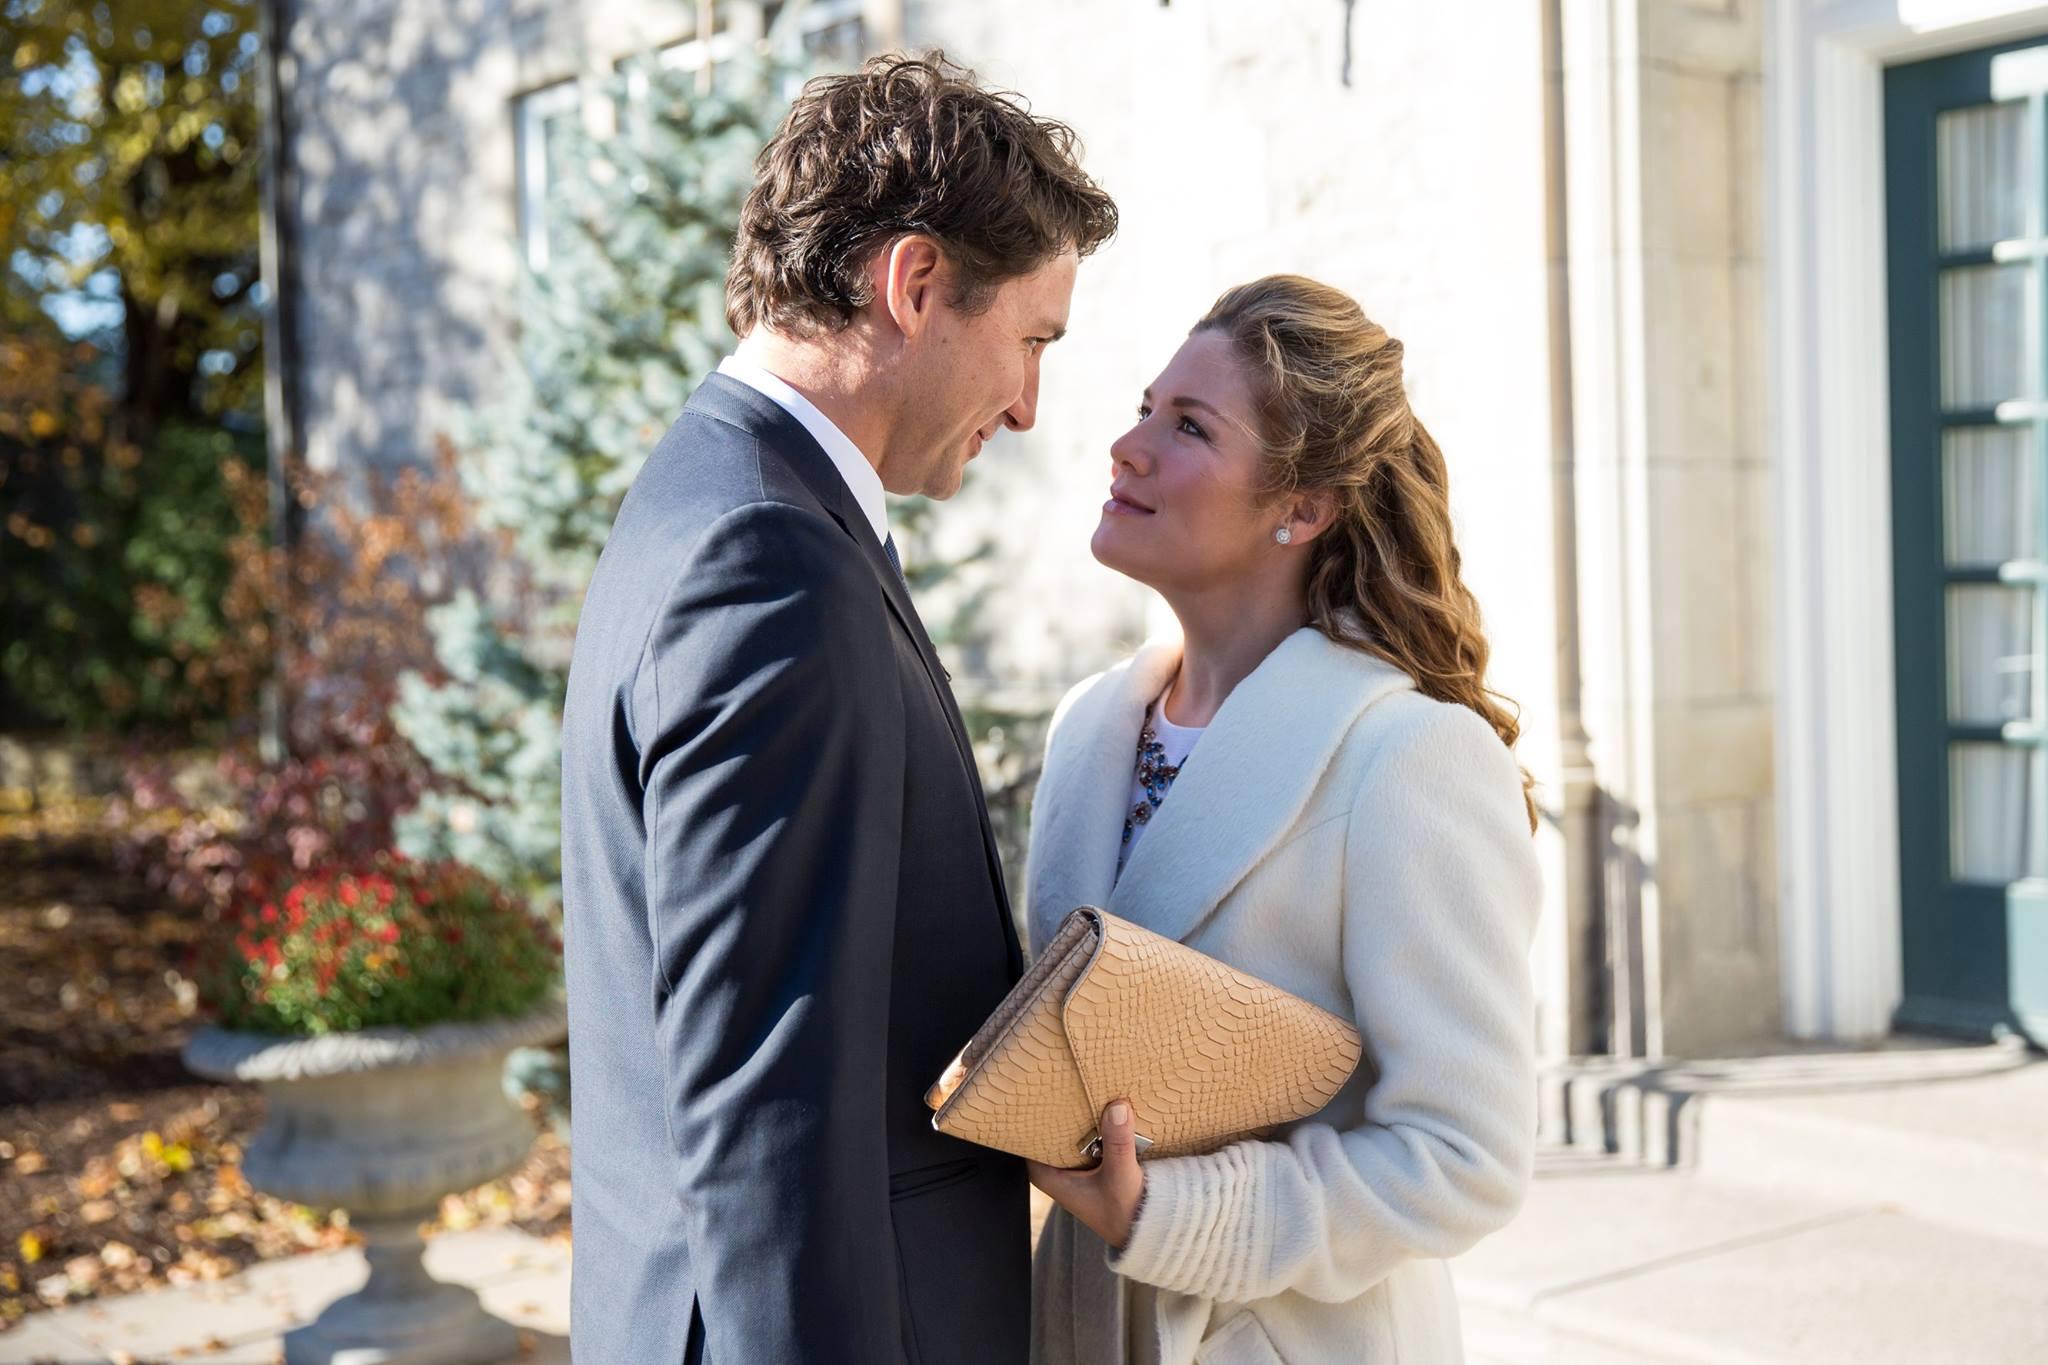 Justin Trudeau and Sophie Grégoire Trudeau (Justin Trudeau/Facebook)